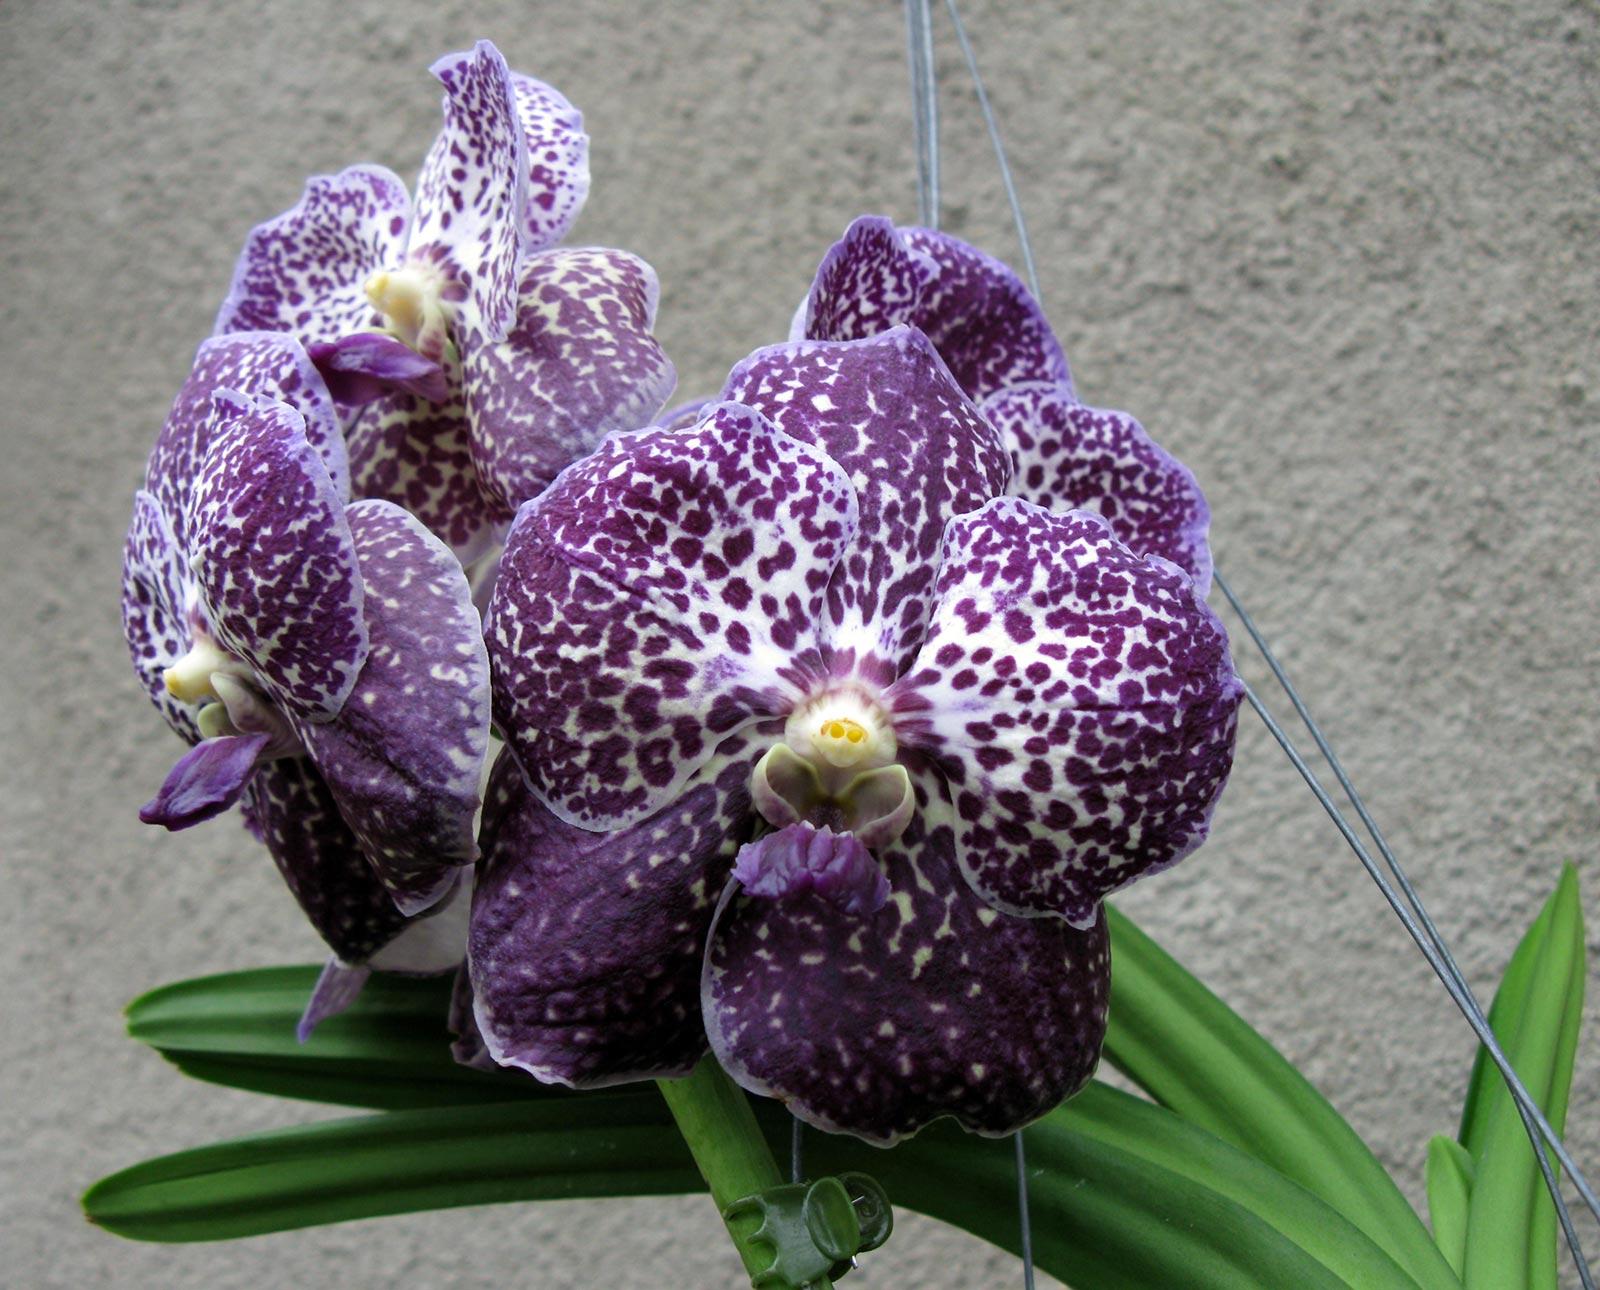 vanda midnight black gro r schener orchideen. Black Bedroom Furniture Sets. Home Design Ideas